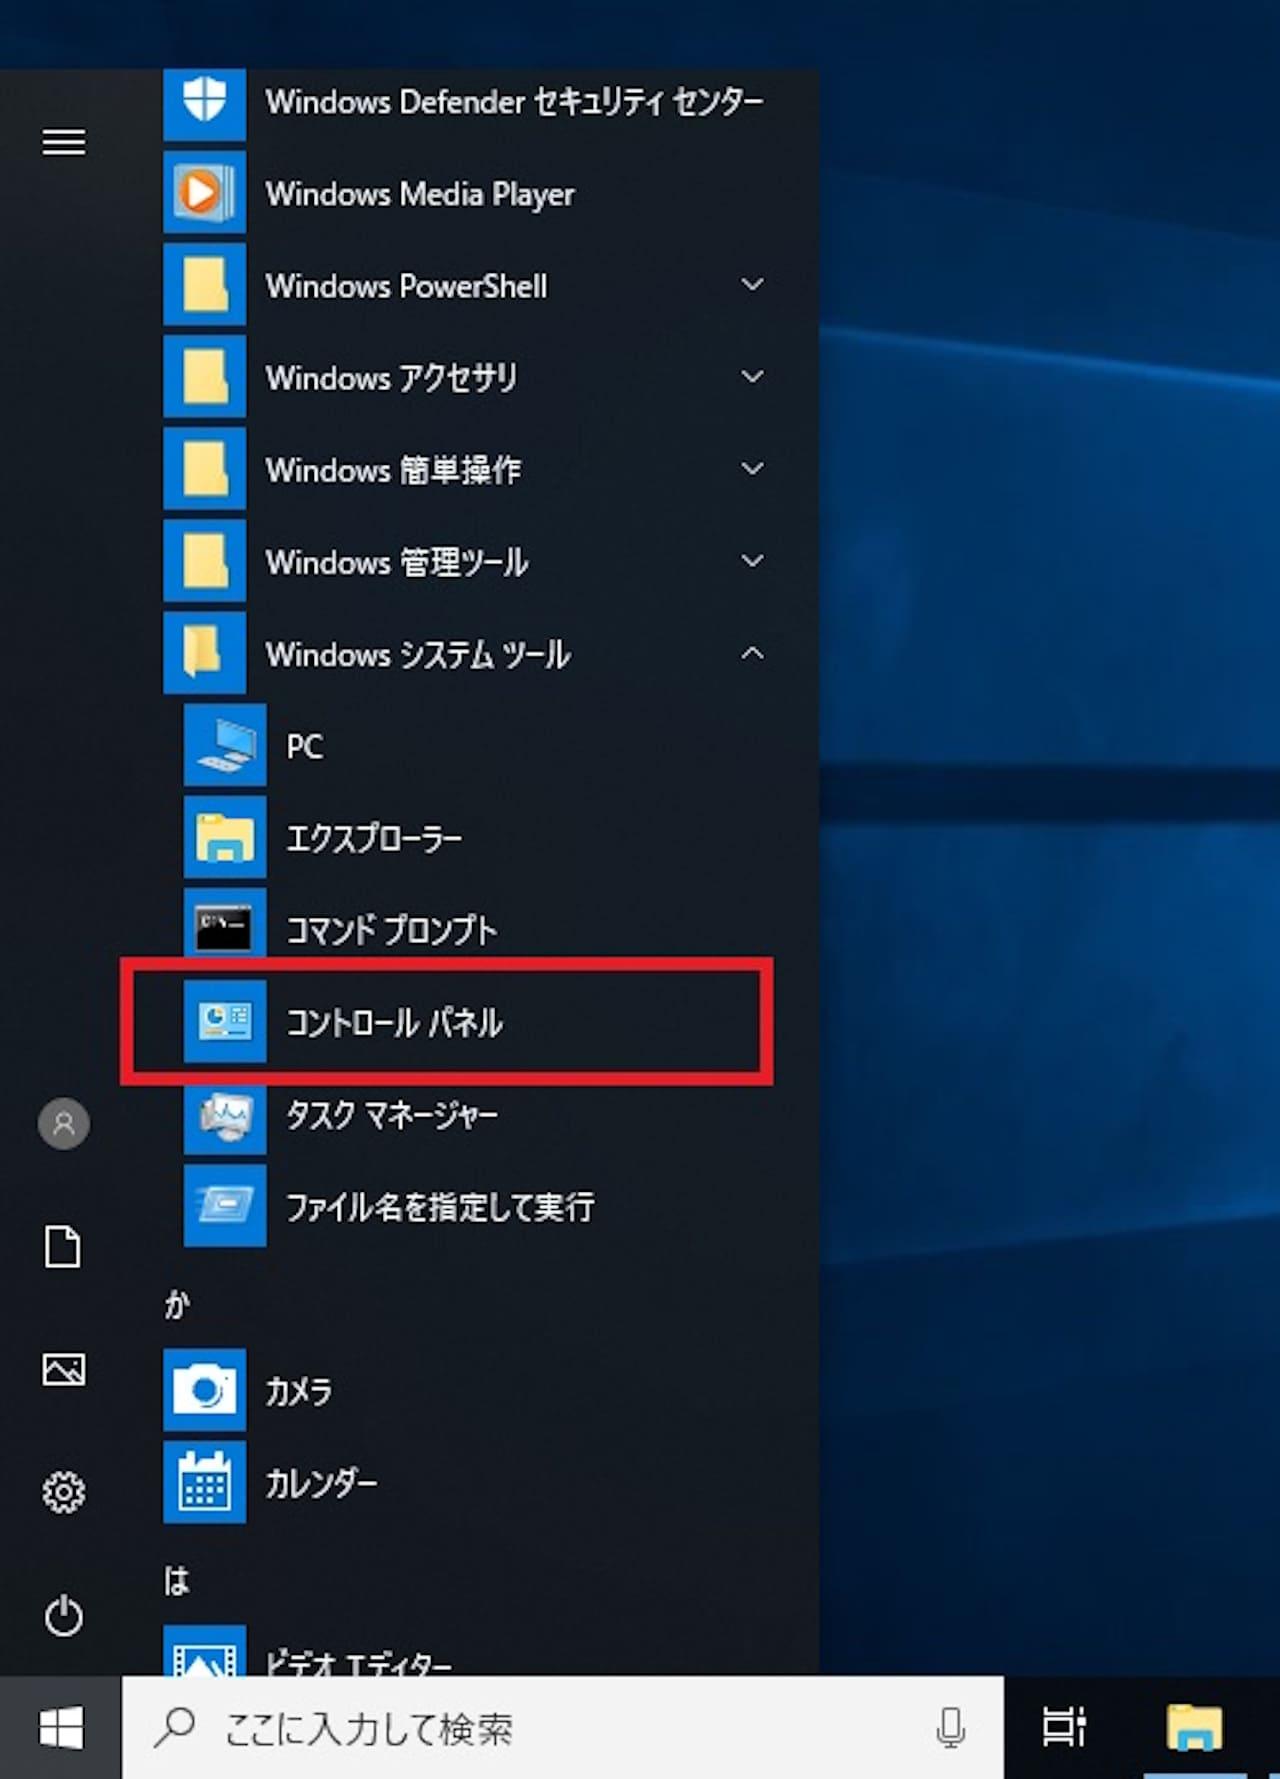 Windowsシステムツールからコントロールパネルを開く方法④